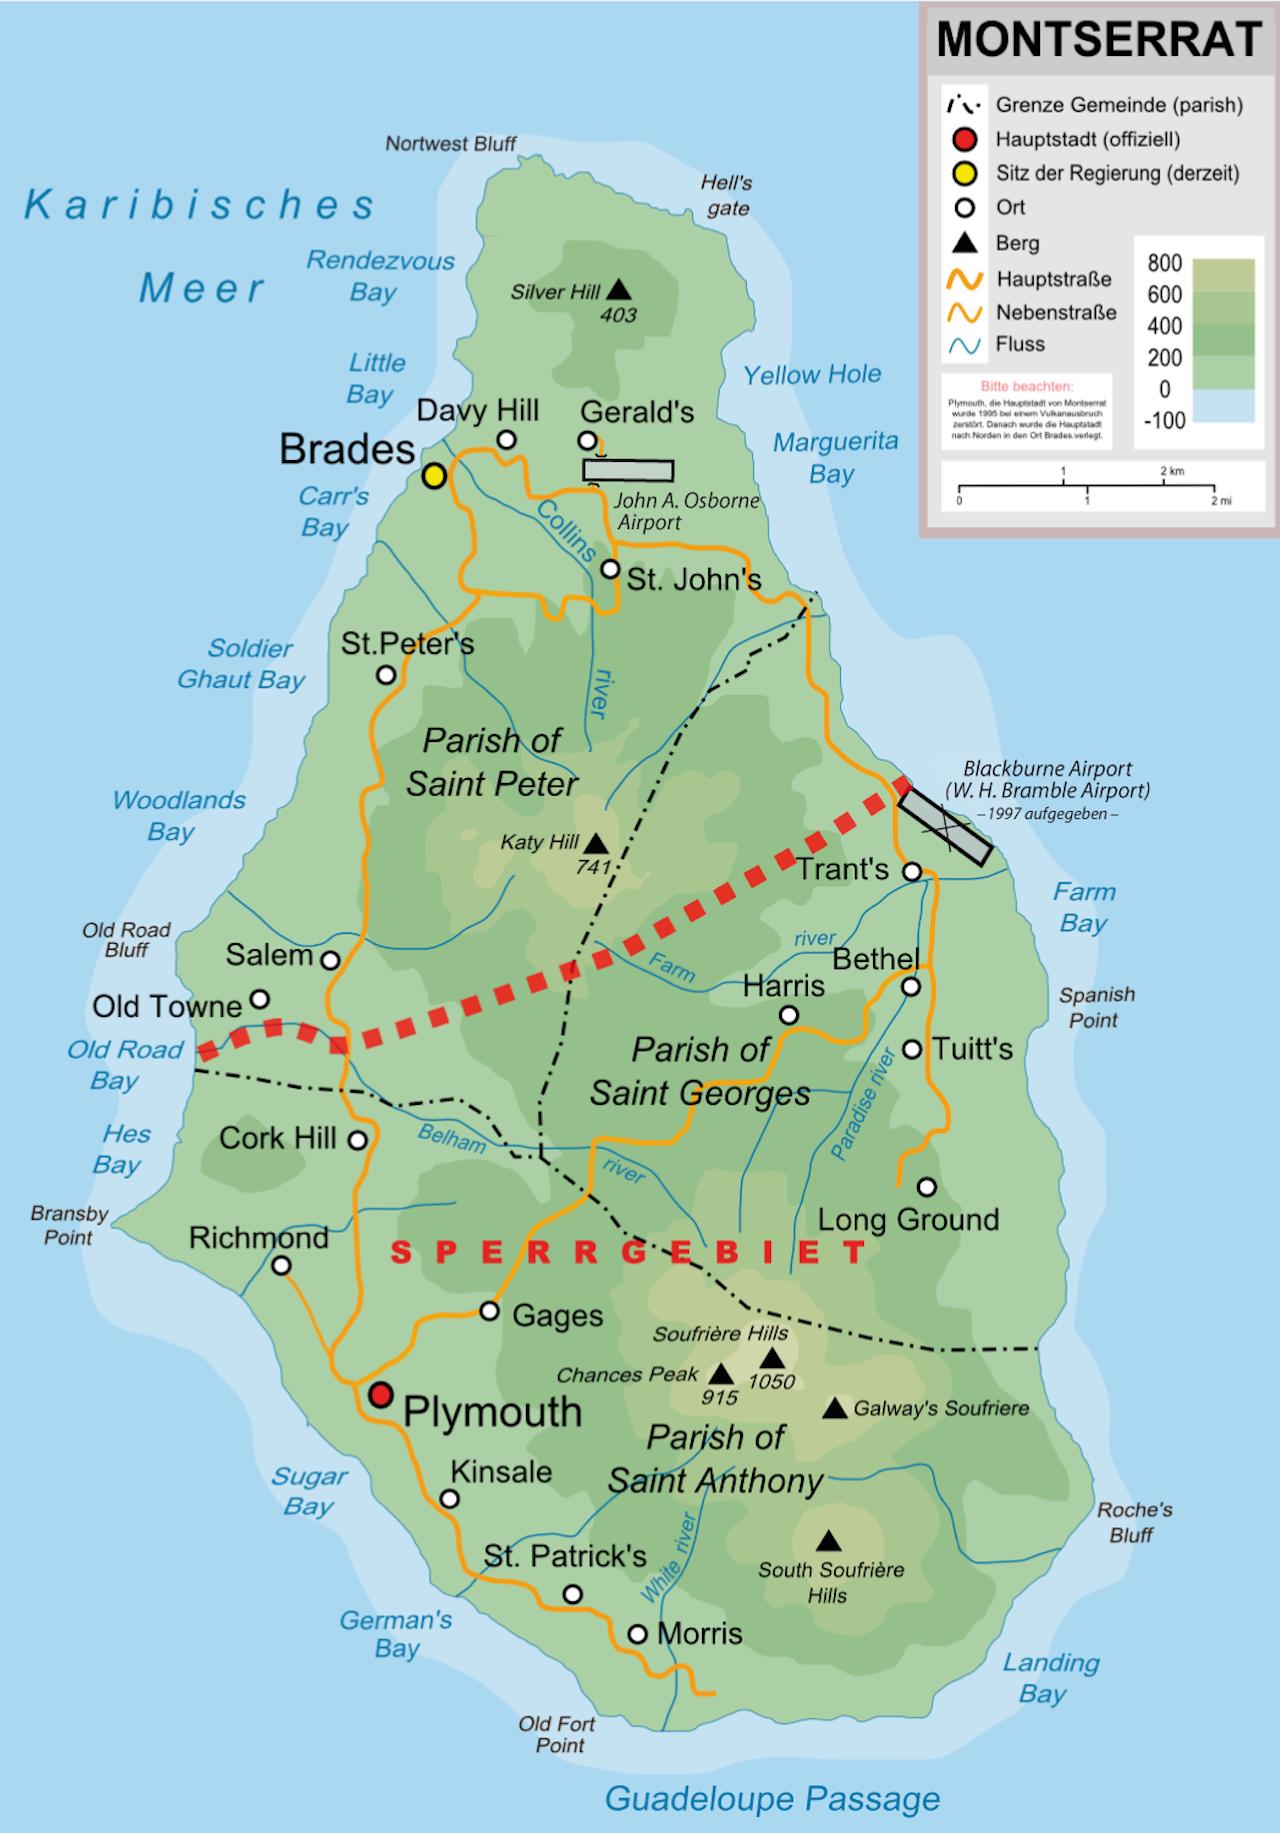 Topographic-map-of-Montserrat-de